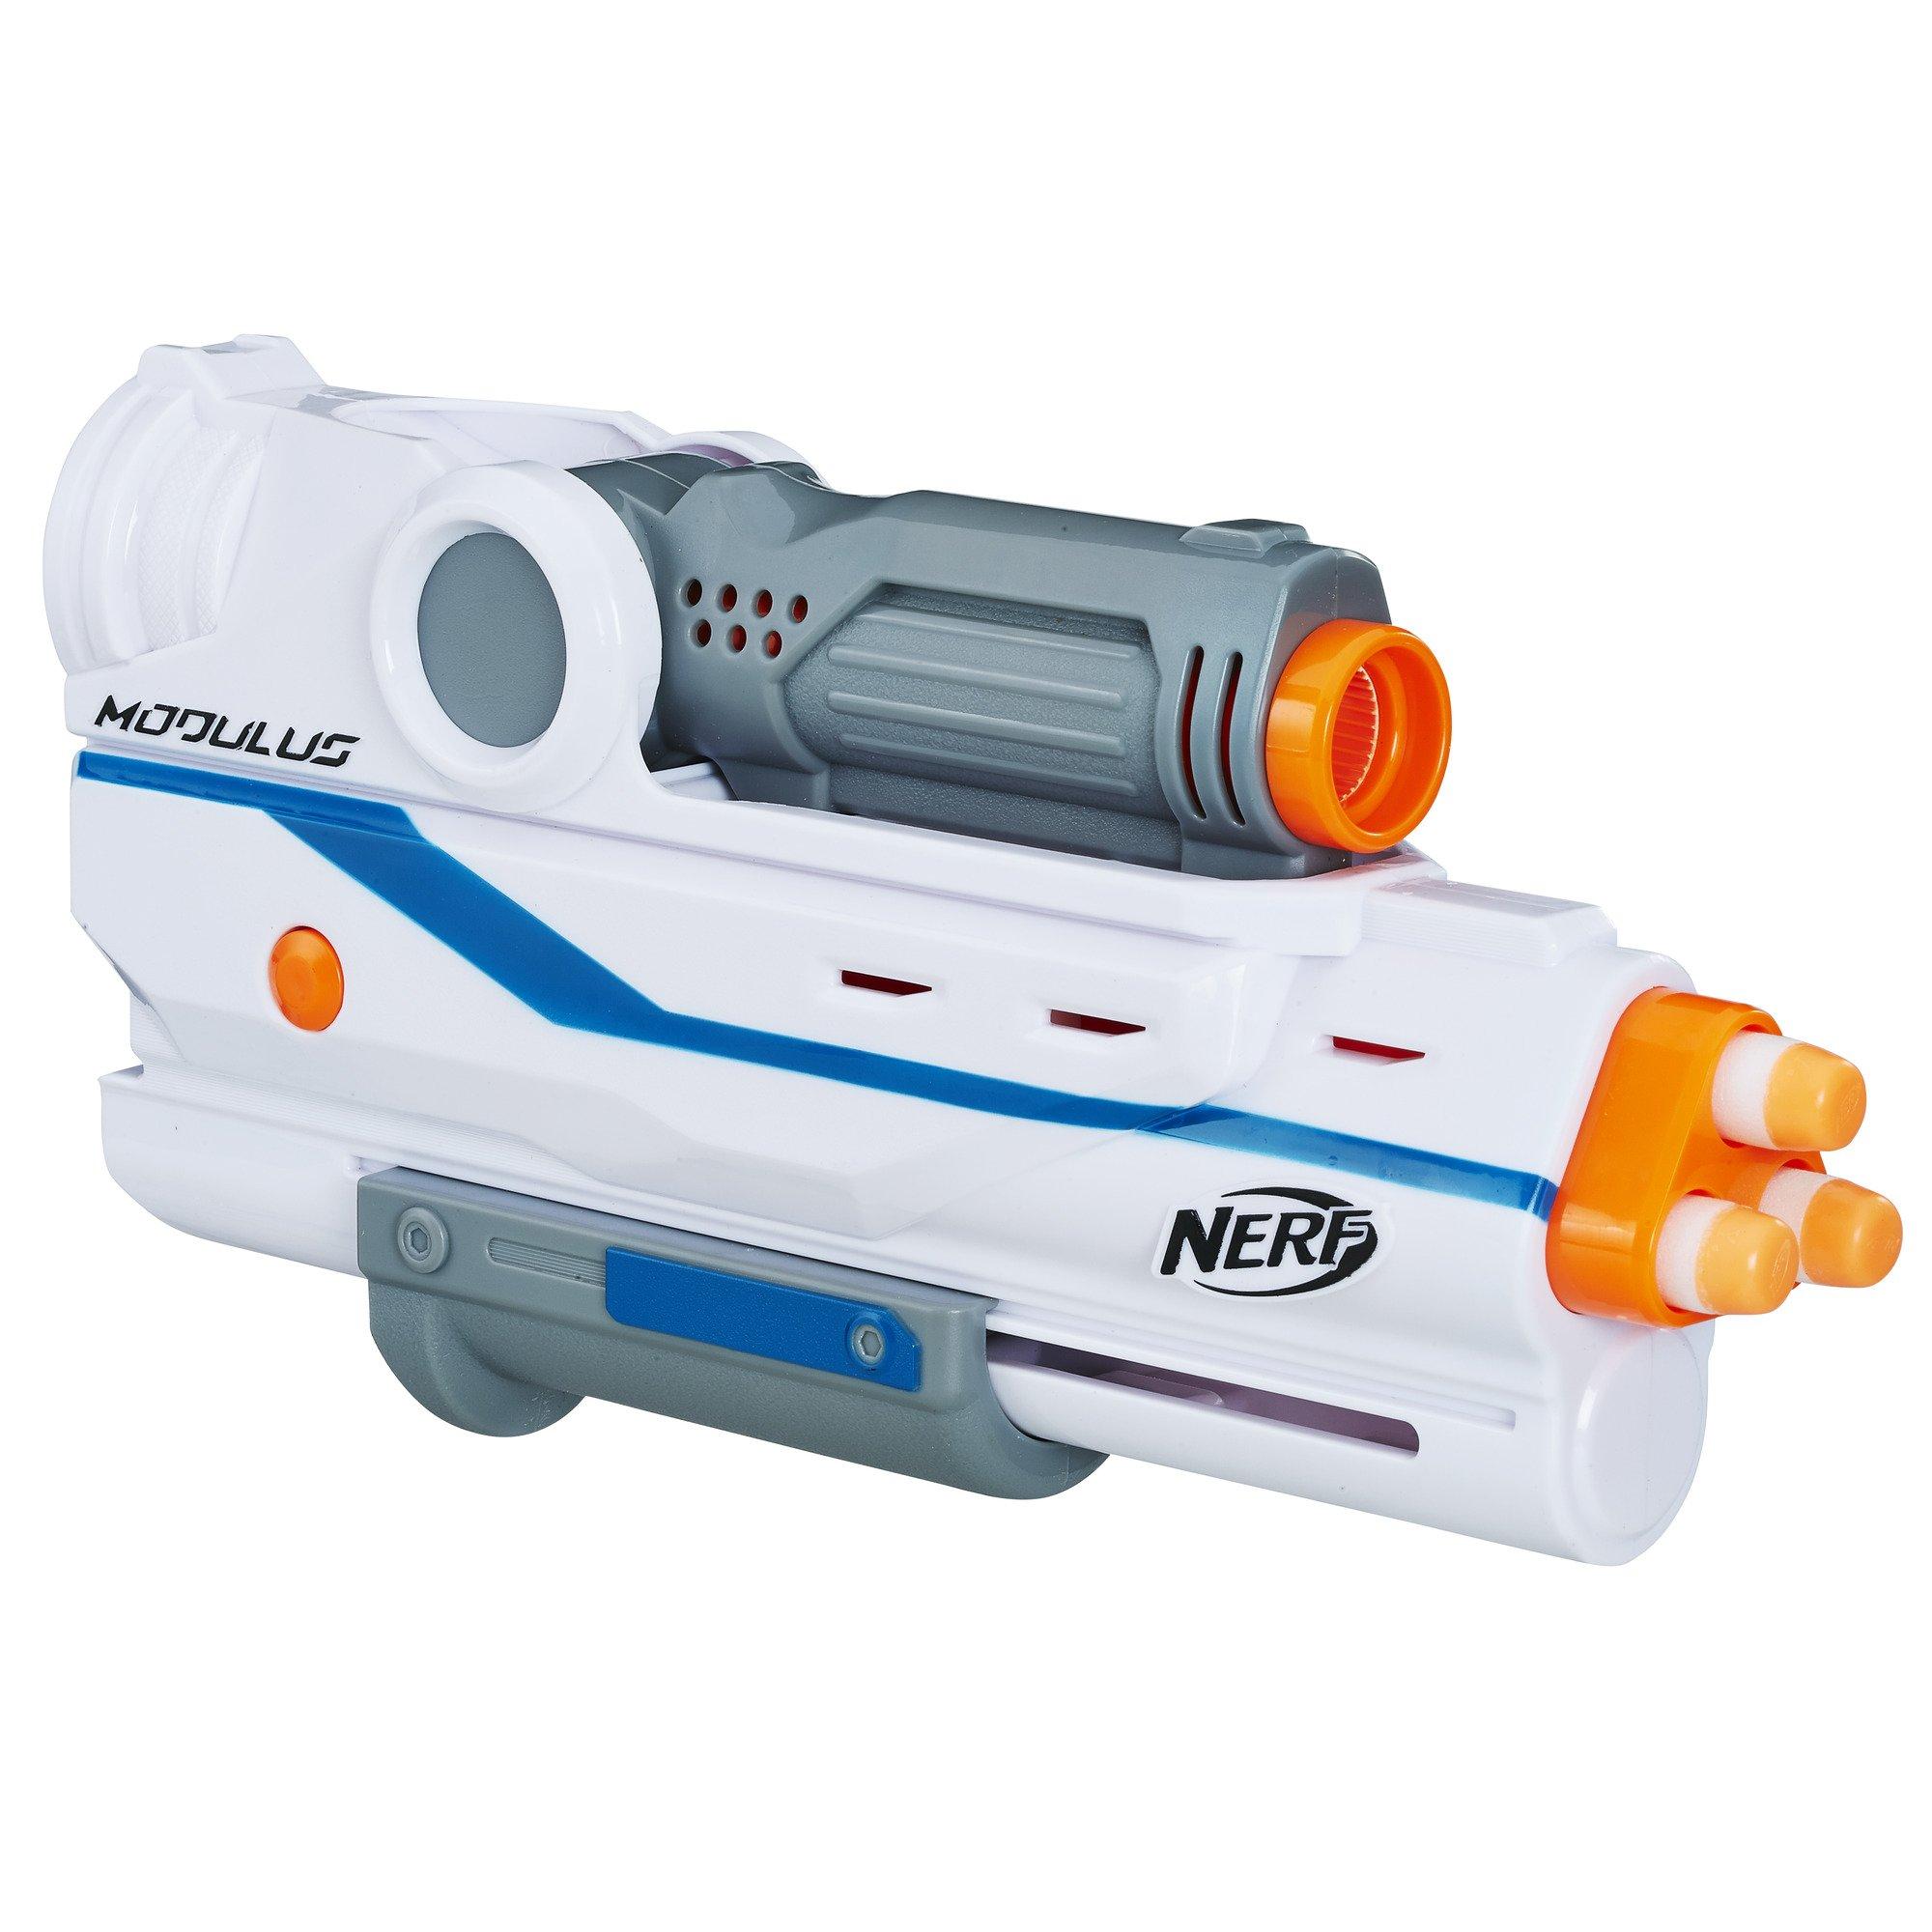 Nerf E0786 Modulus Mediator Barrel Battle Toy